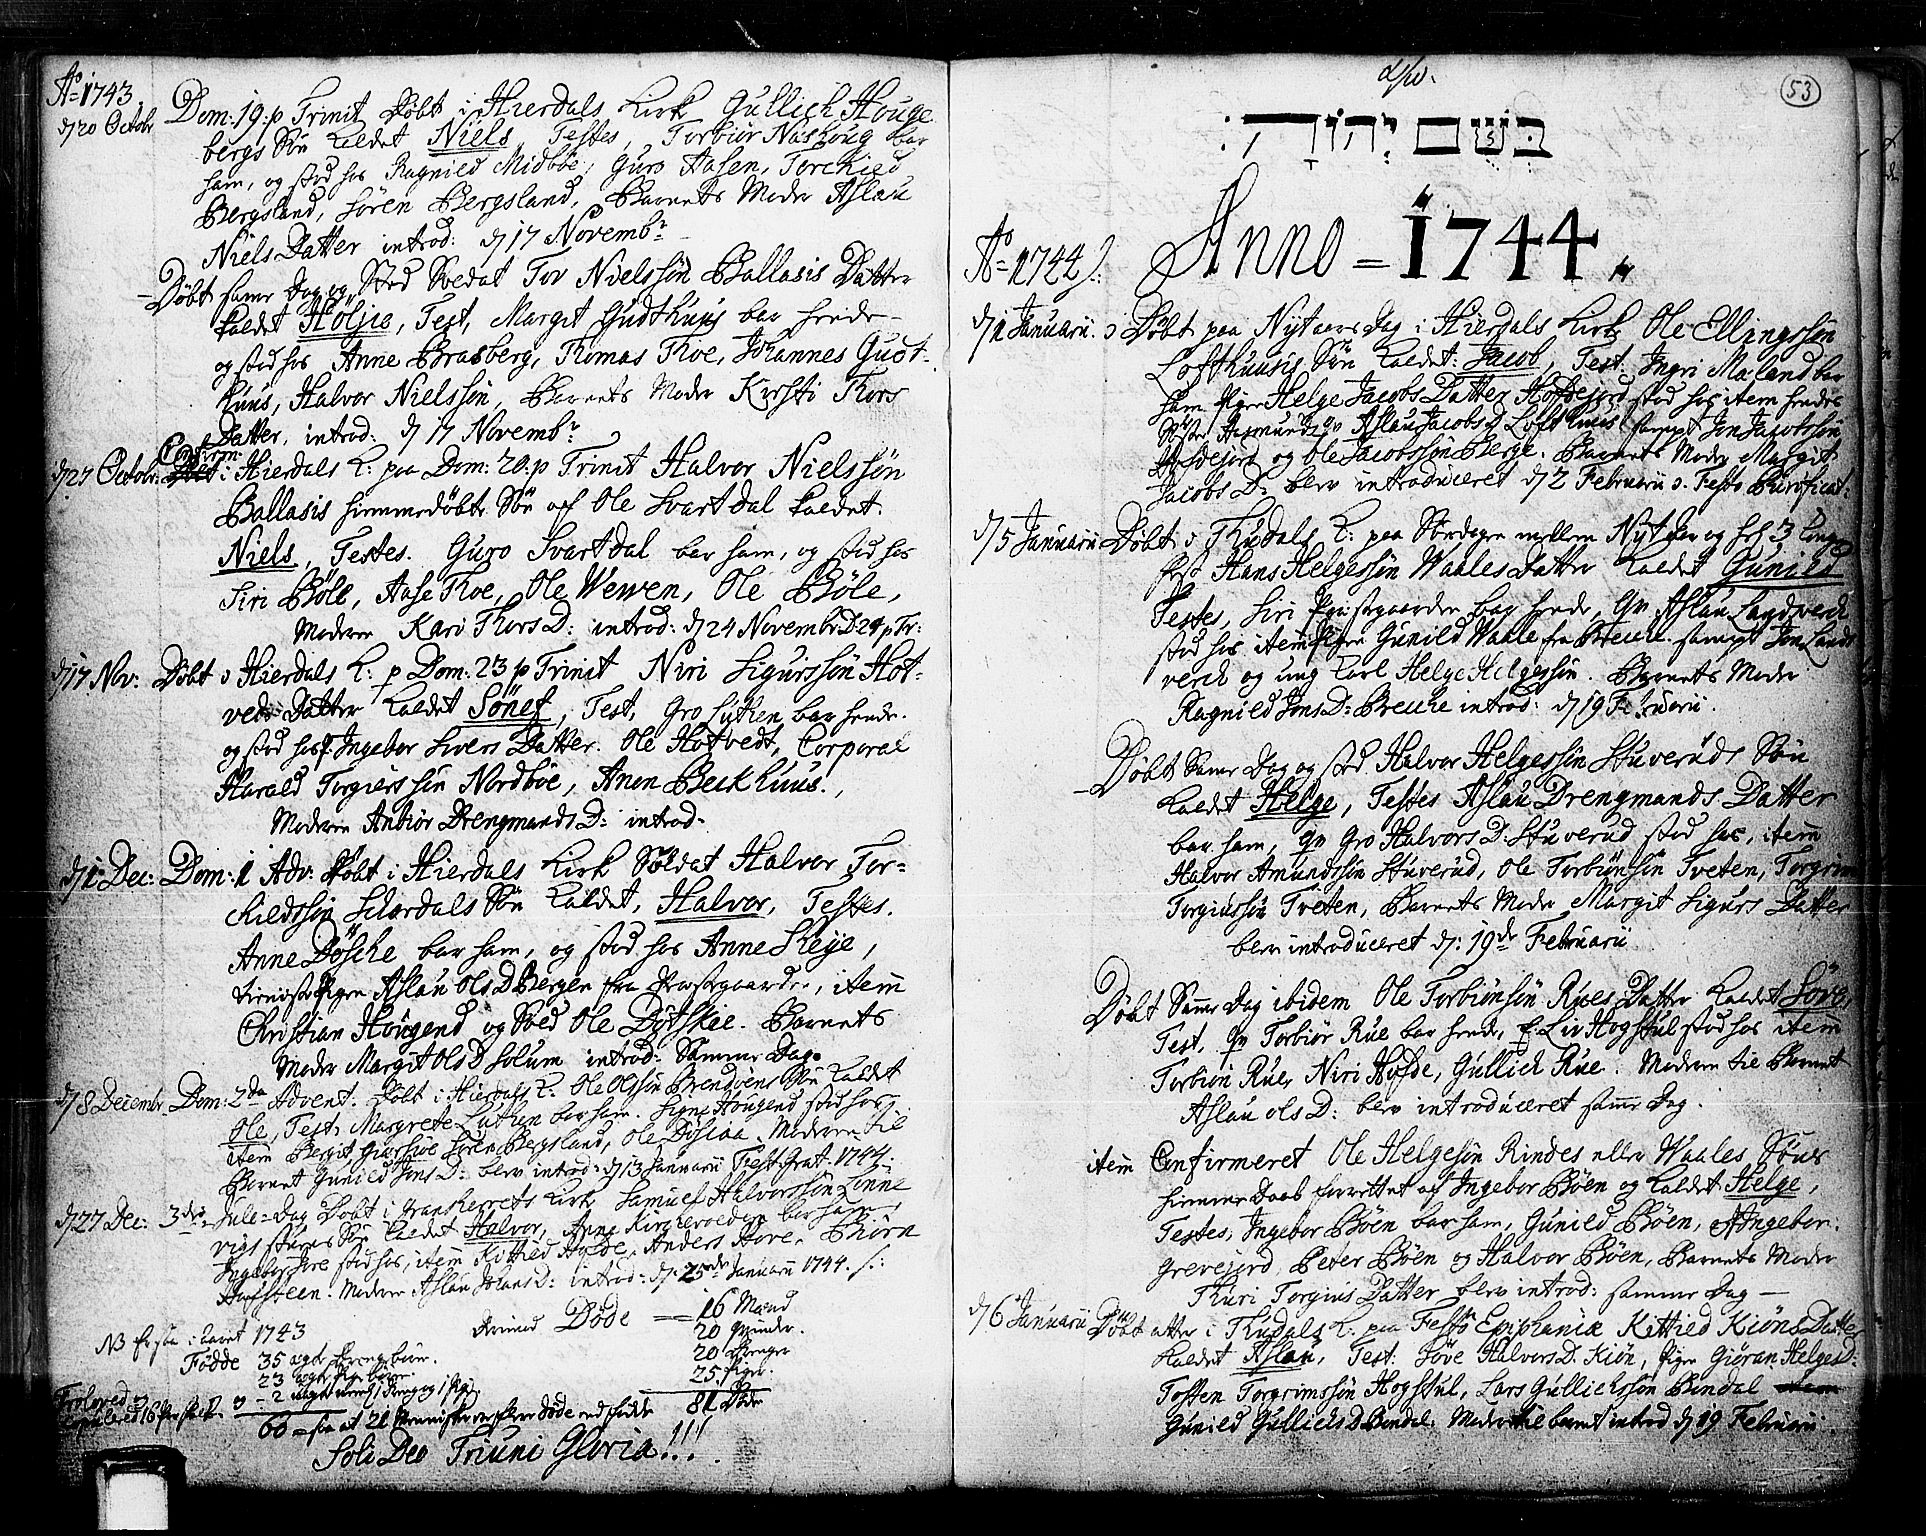 SAKO, Hjartdal kirkebøker, F/Fa/L0003: Ministerialbok nr. I 3, 1727-1775, s. 53